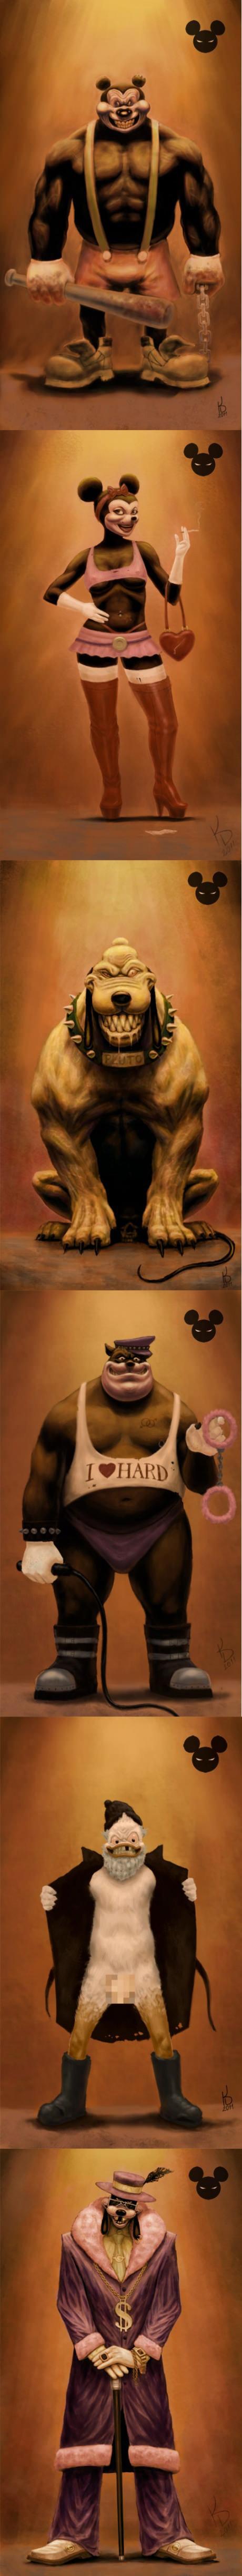 Disney Characters Reimagined. .. It's Goofizzle.